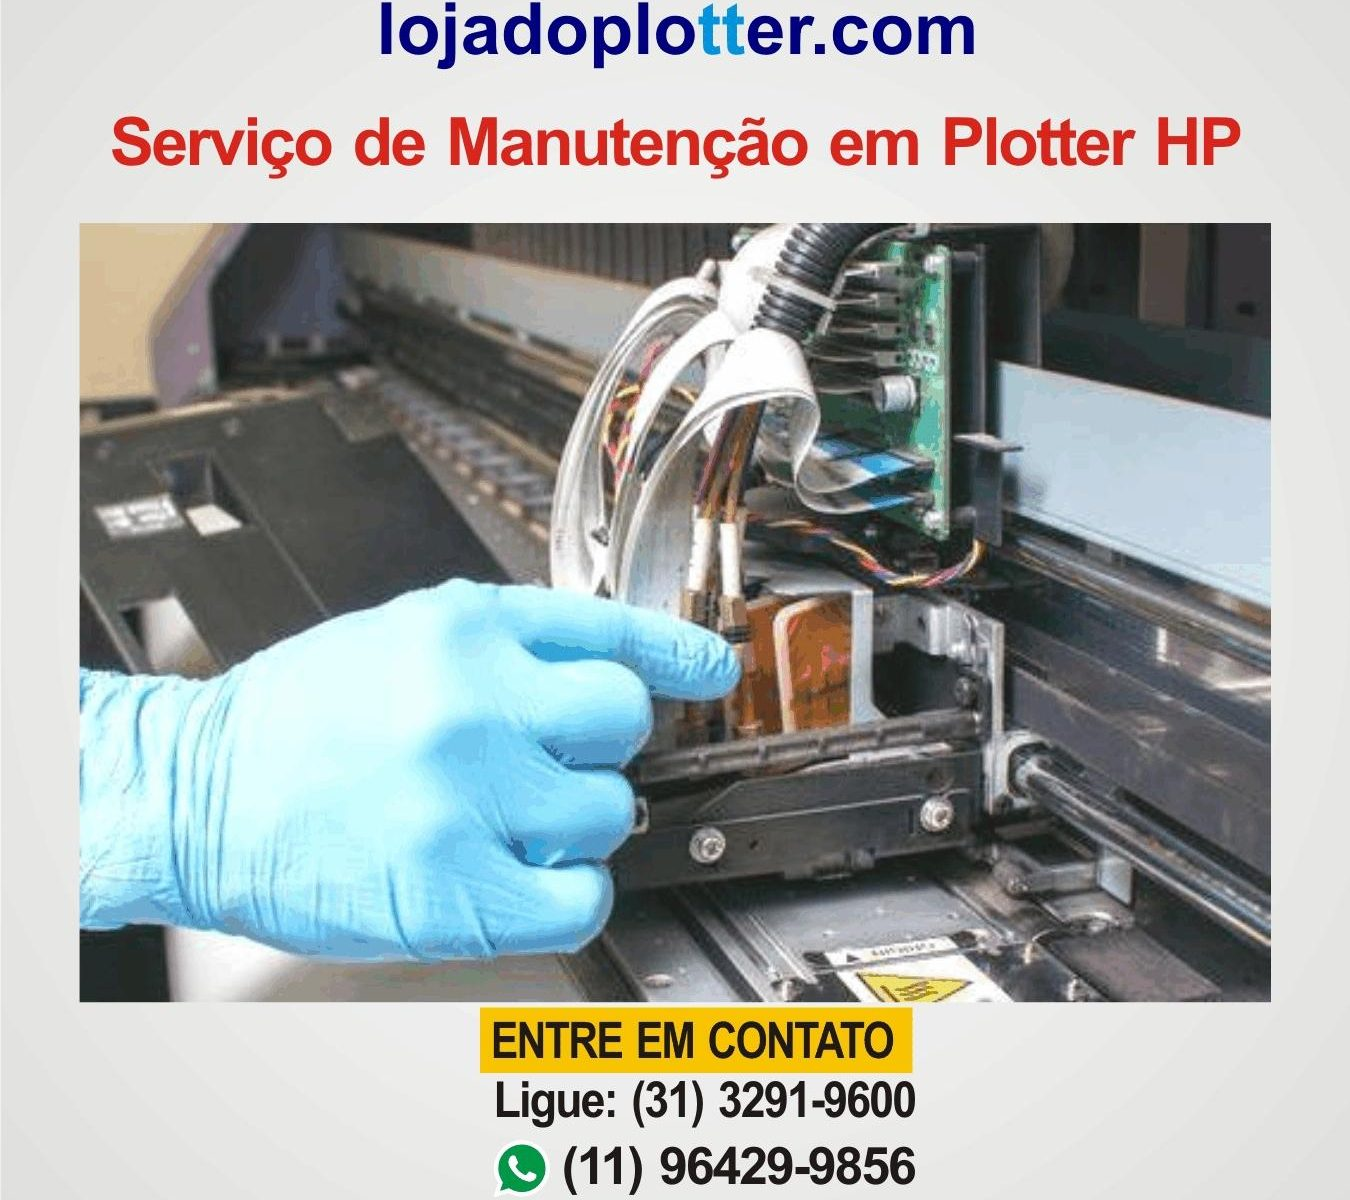 Manutencao Reparo Conserto Plotter HP